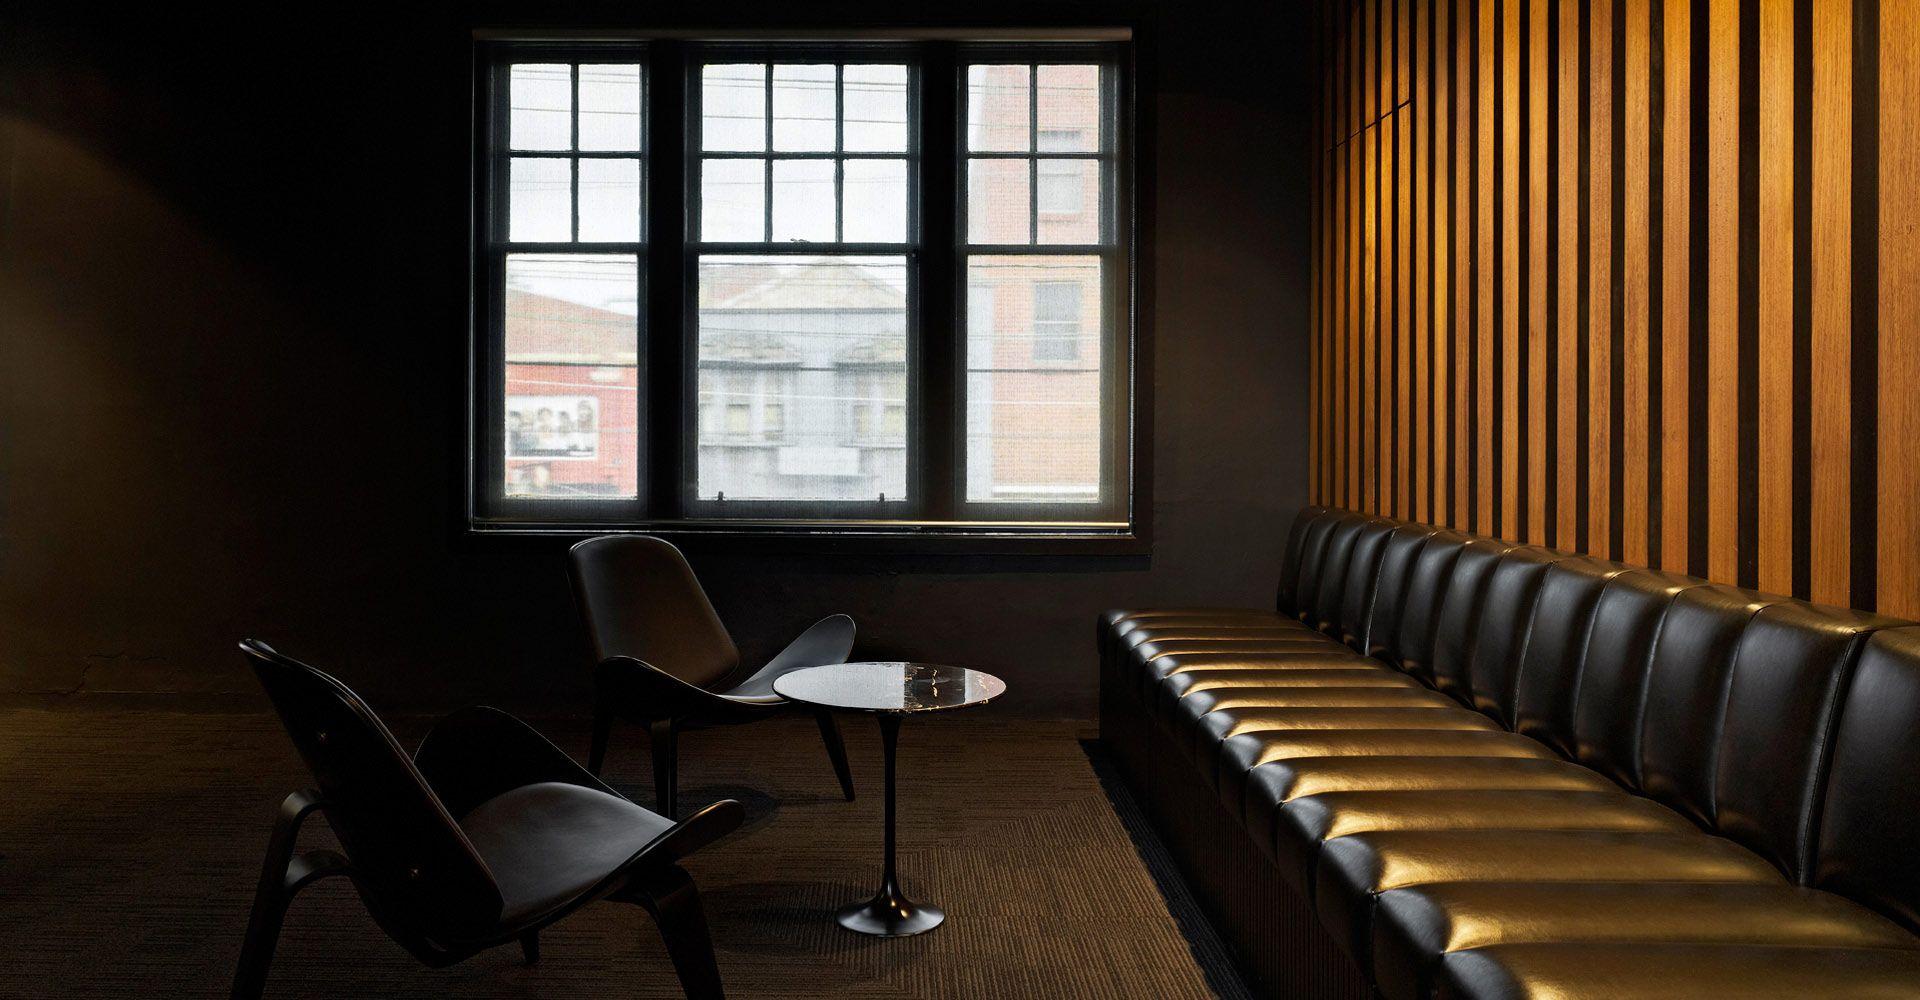 Hoyne Design Office 102 Chapel Street St Kilda Client